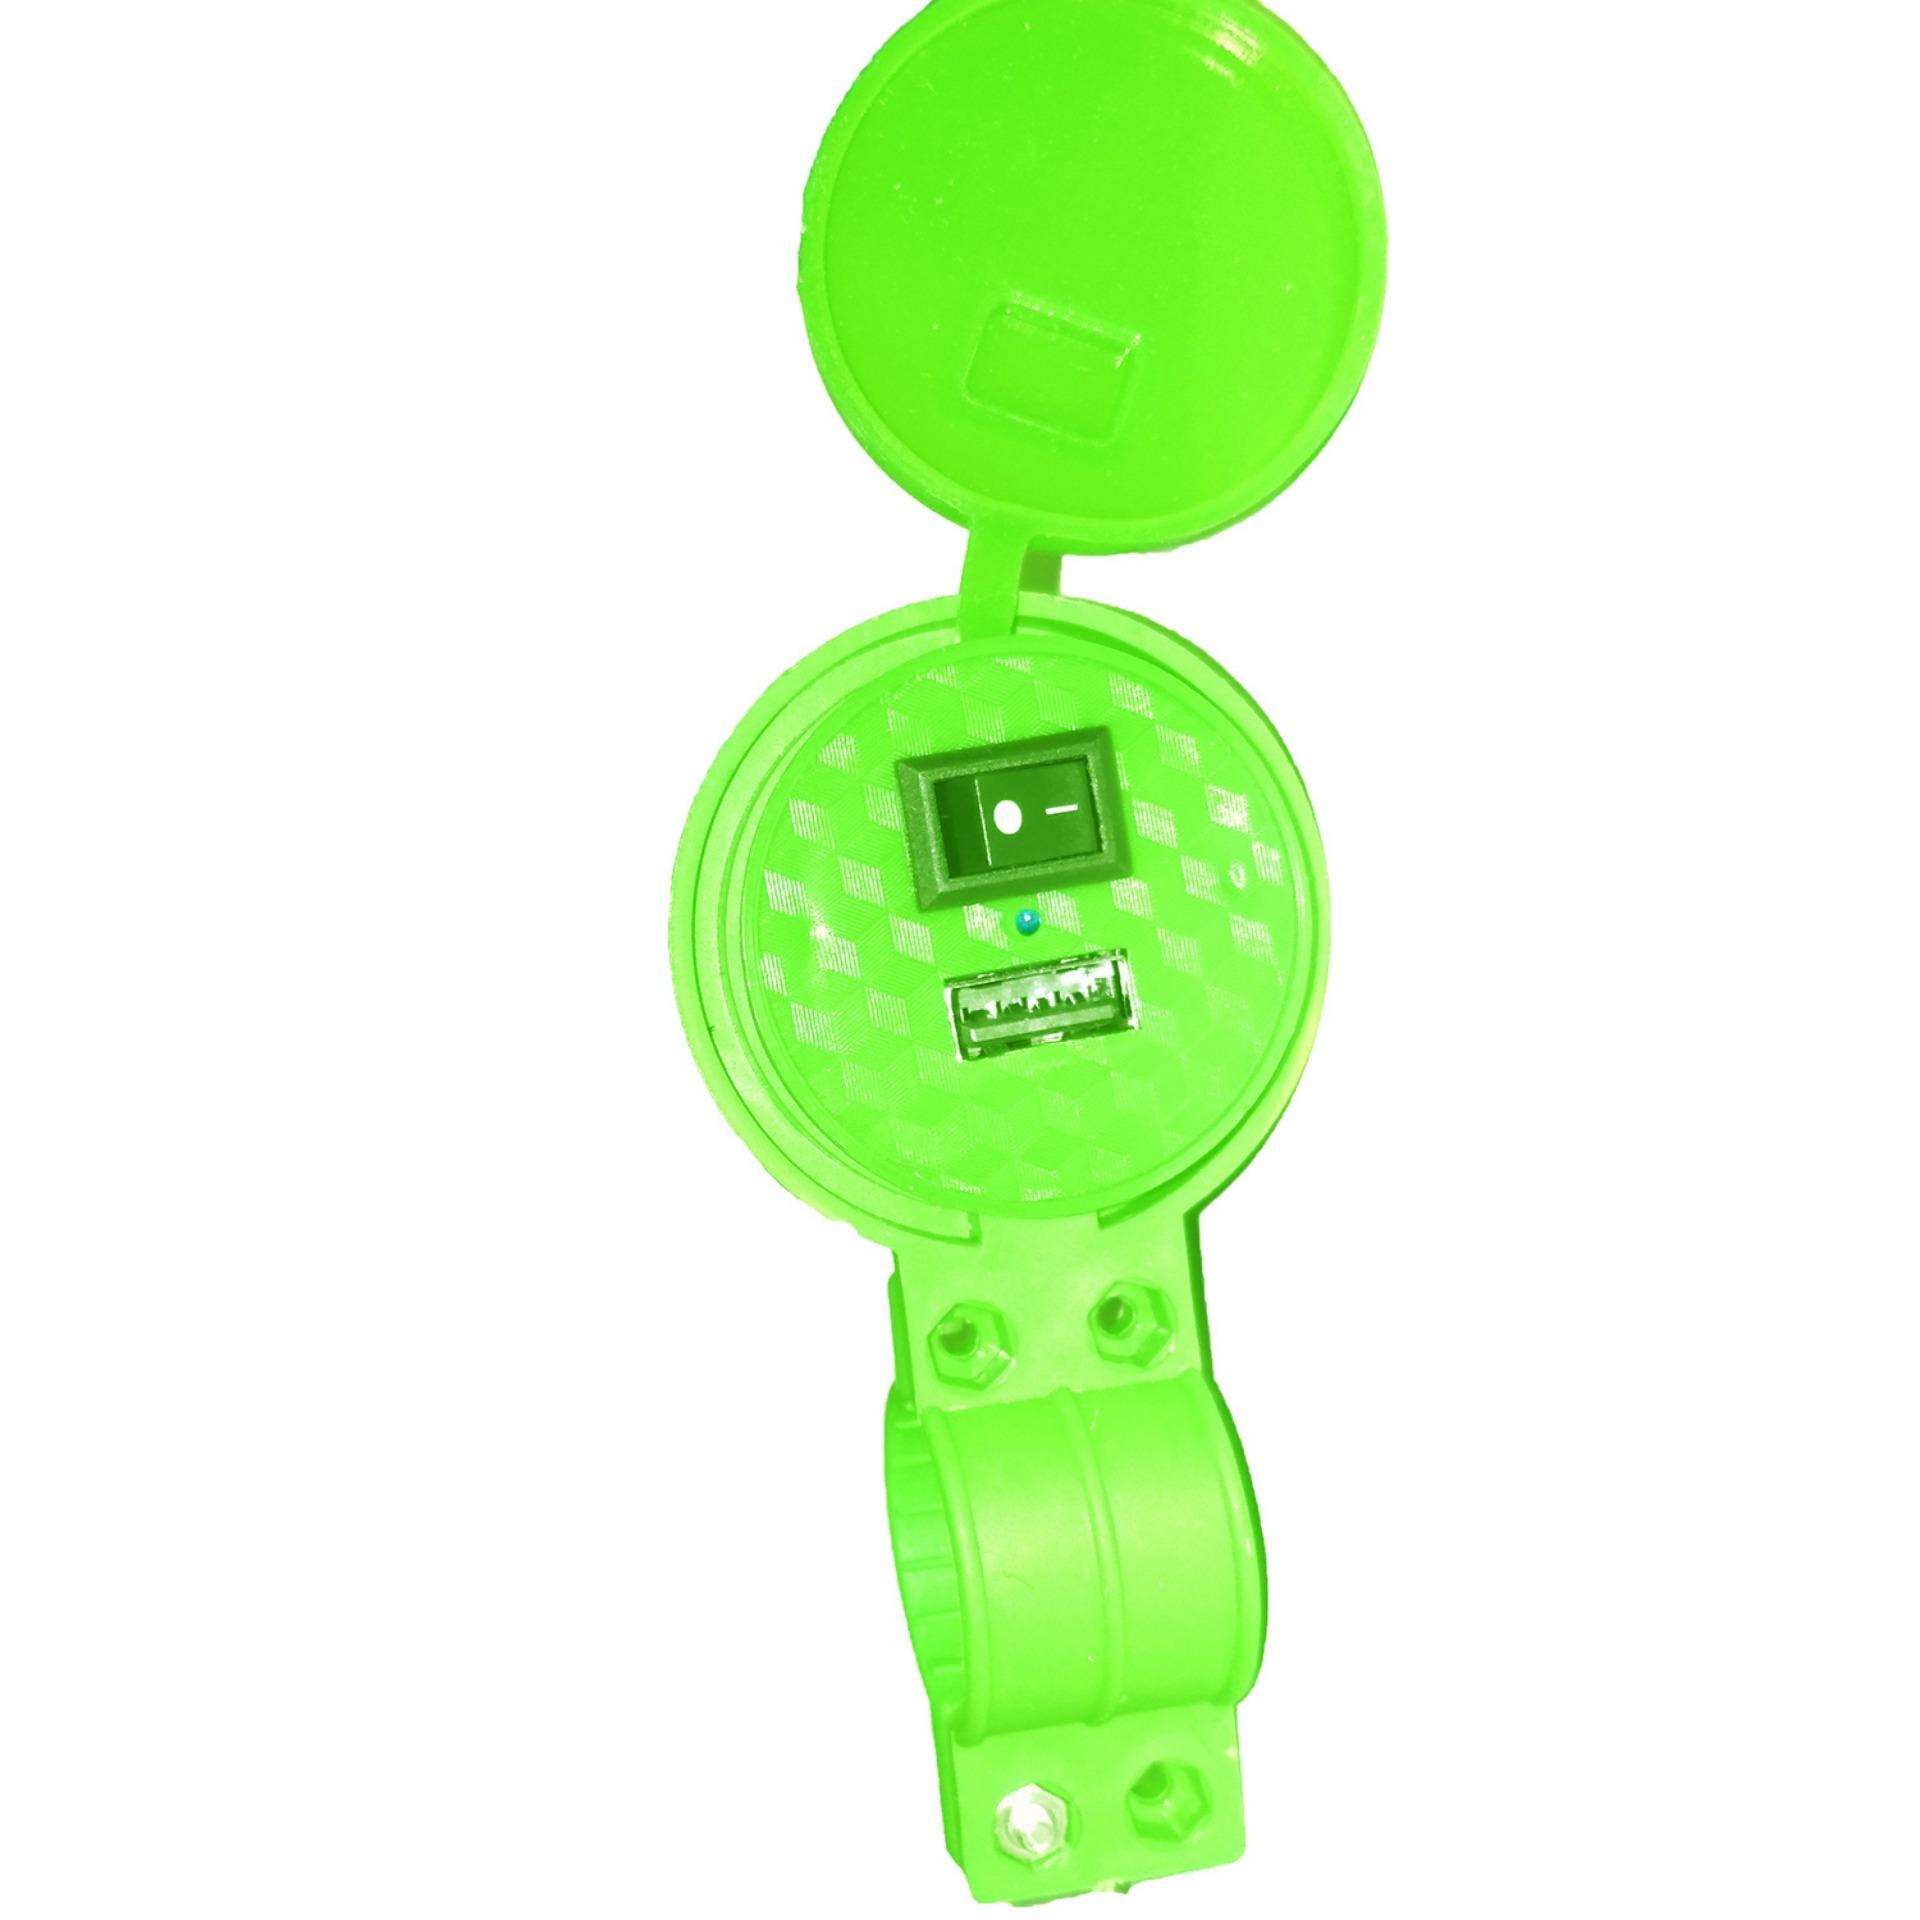 ... USB Charger Motor Waterproof Cas HP di